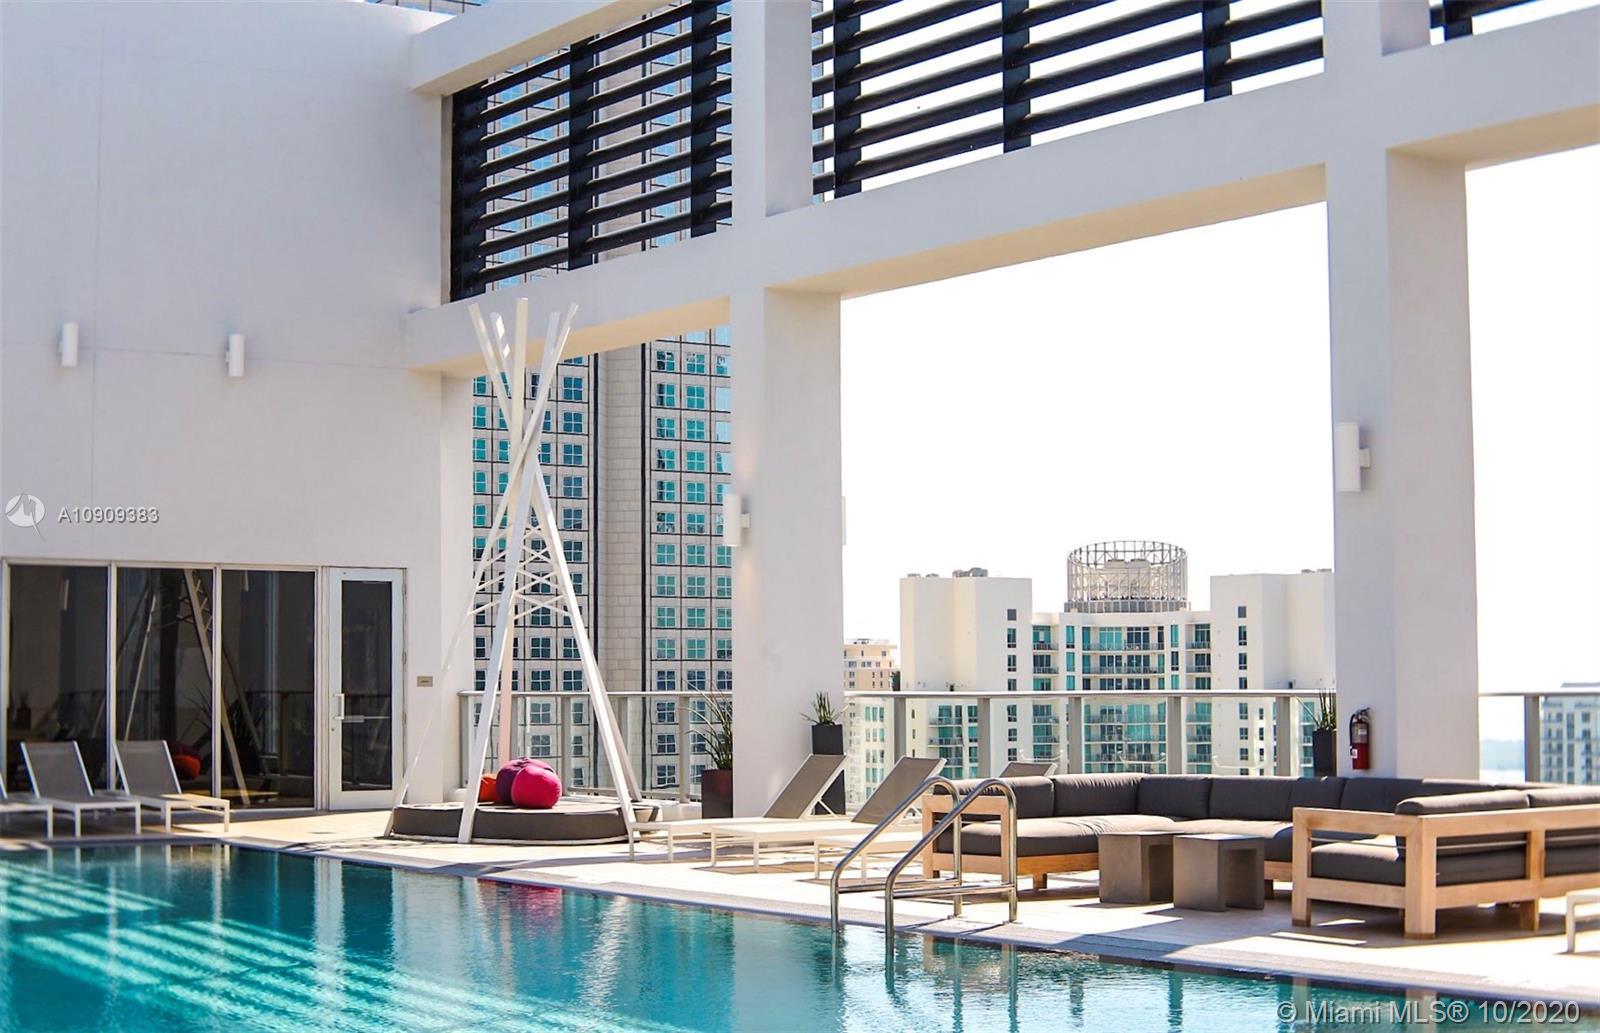 Centro Condos For Sale And Rent In Downtown Miami Fl 33131